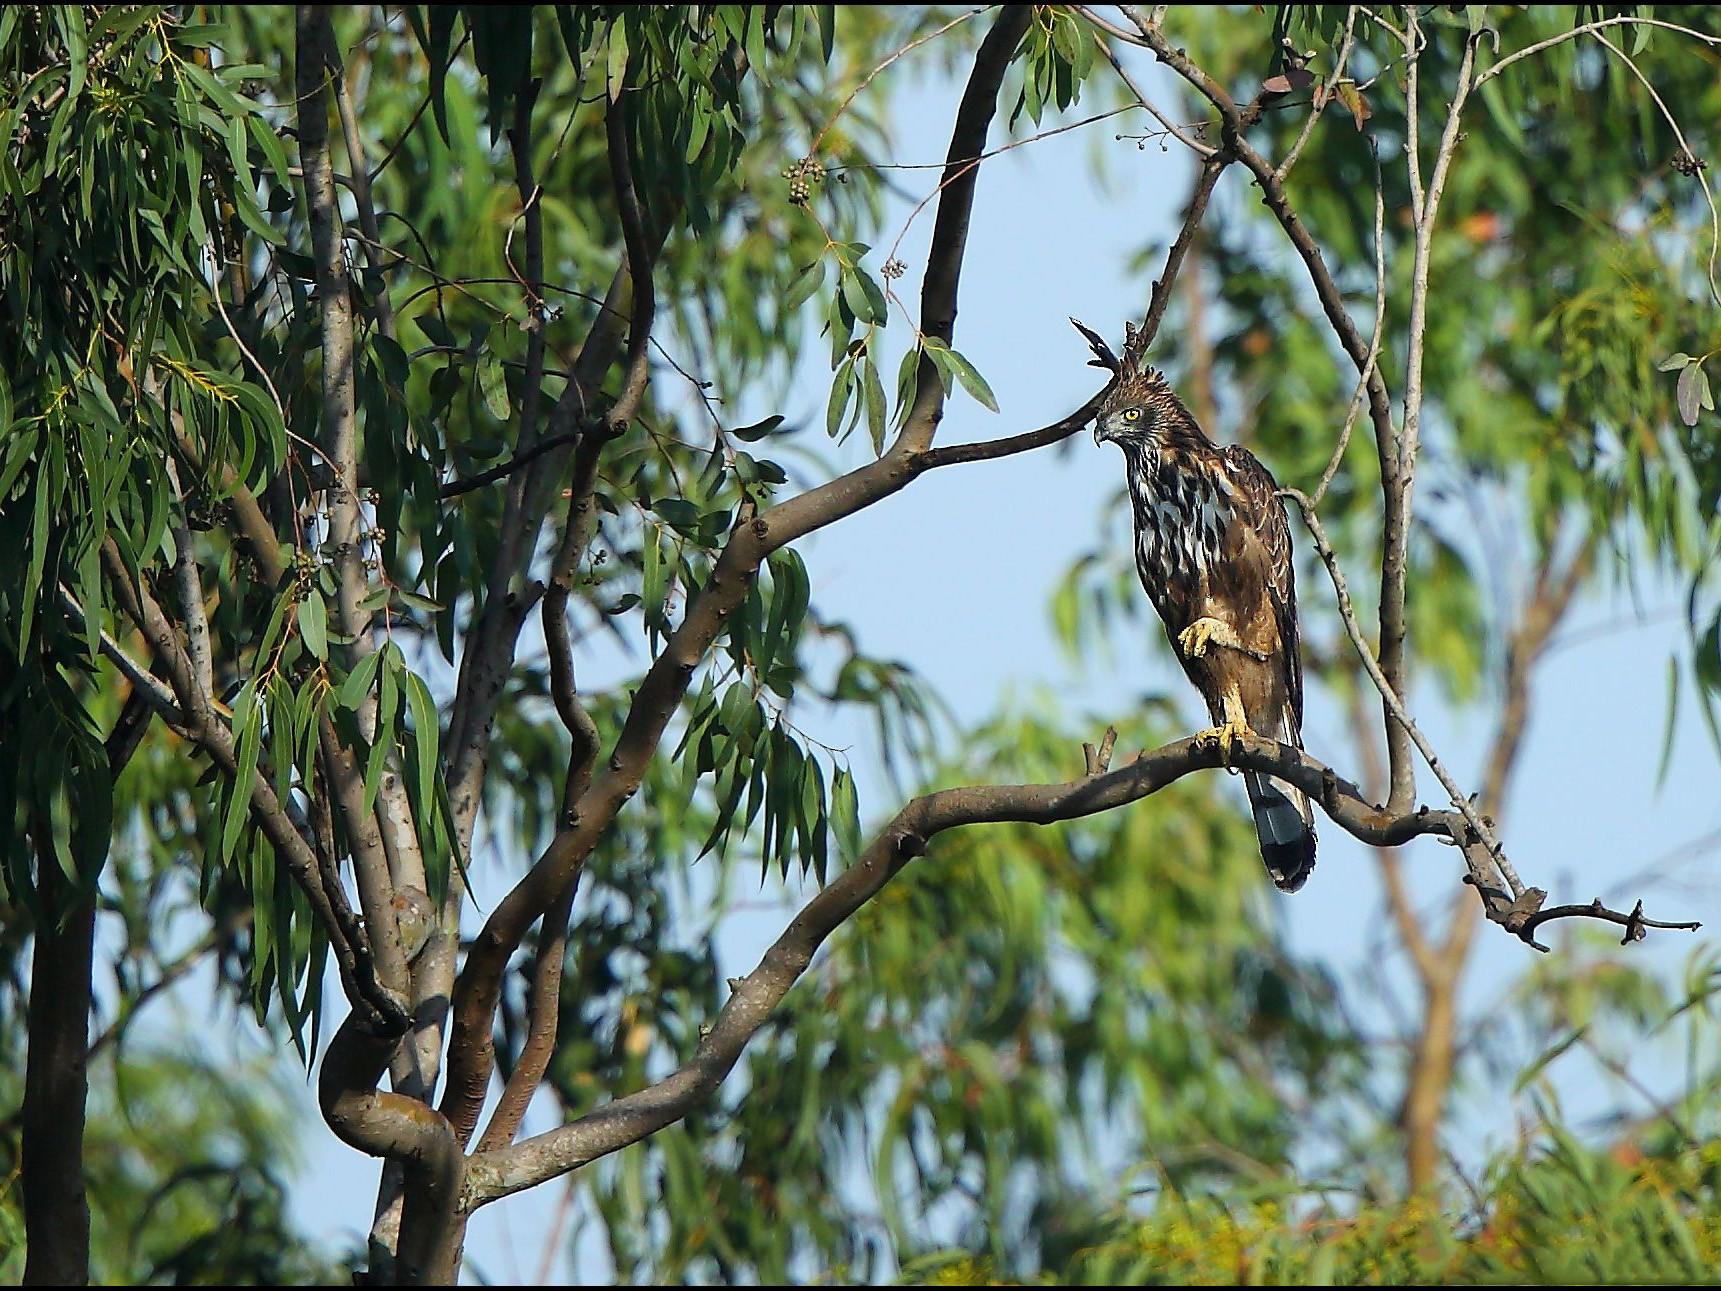 Changeable Hawk-Eagle - Albin Jacob